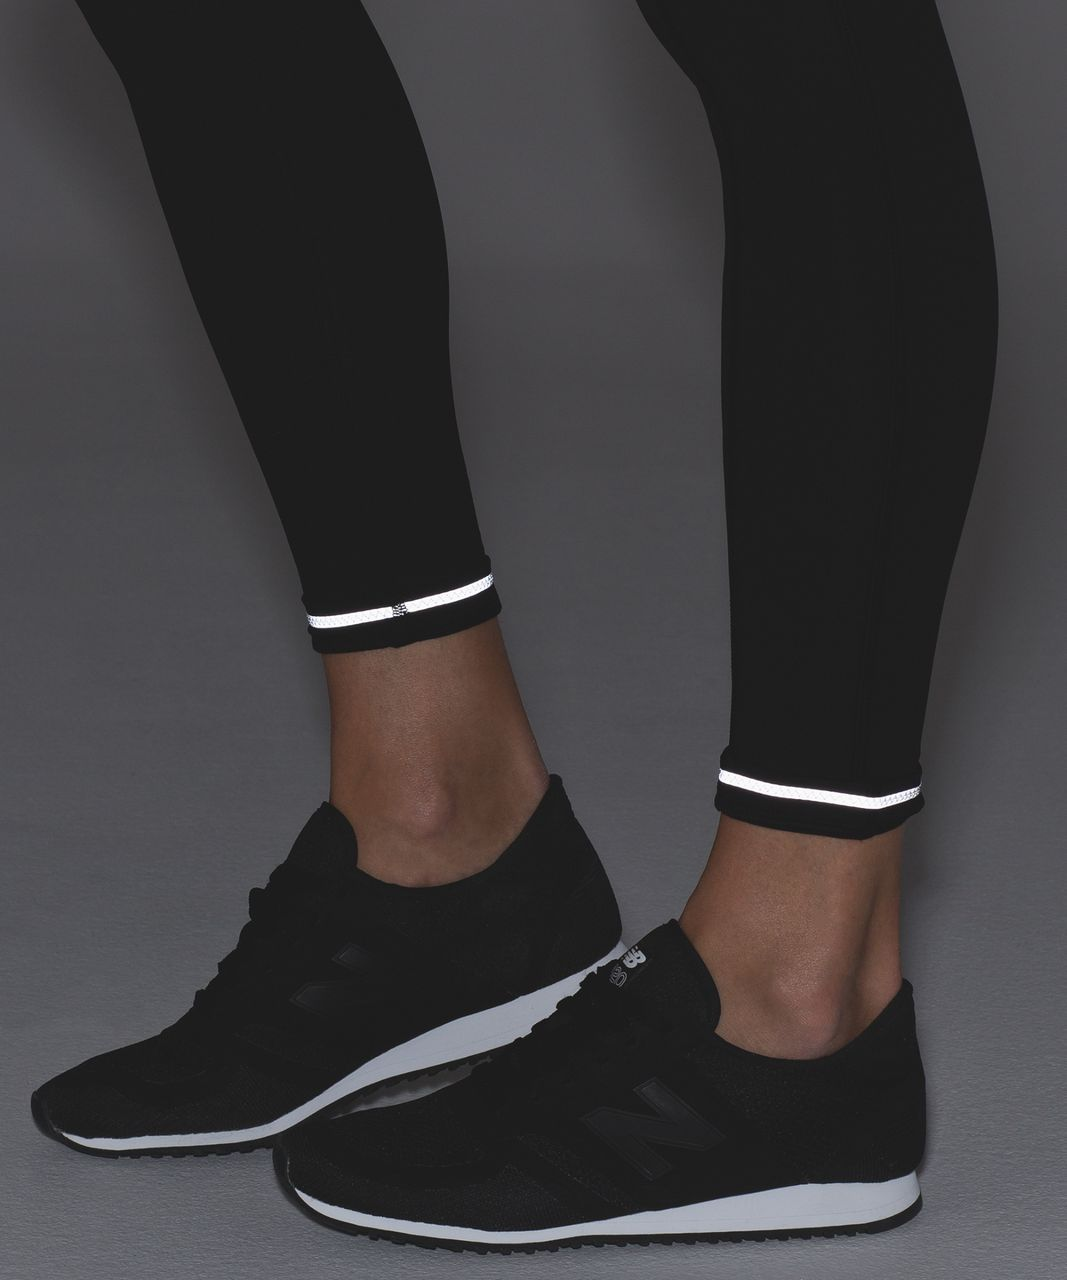 Lululemon Speed Tight V (Brushed) - Black